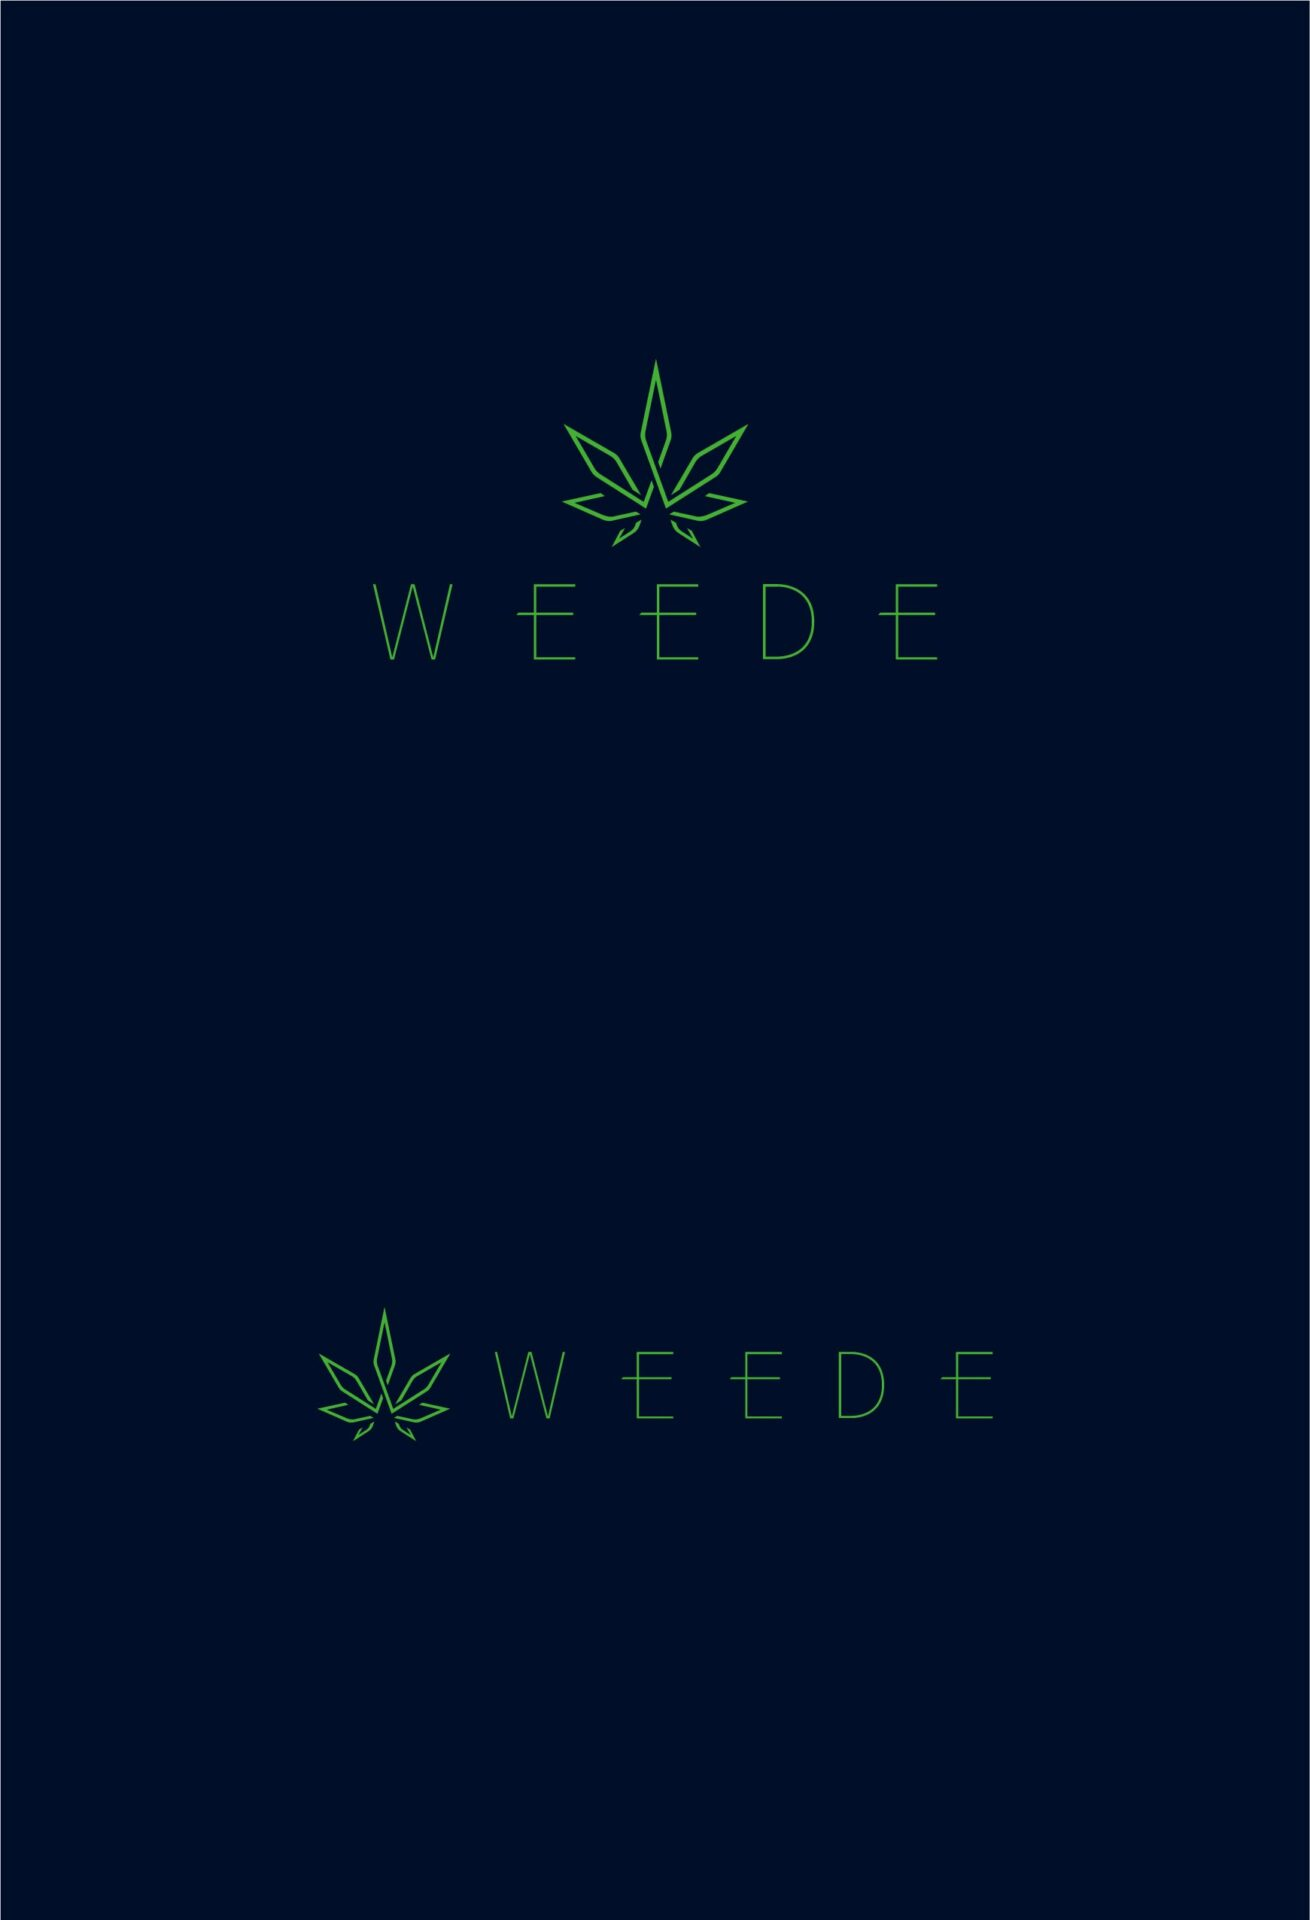 「WEEDE」の実績画像